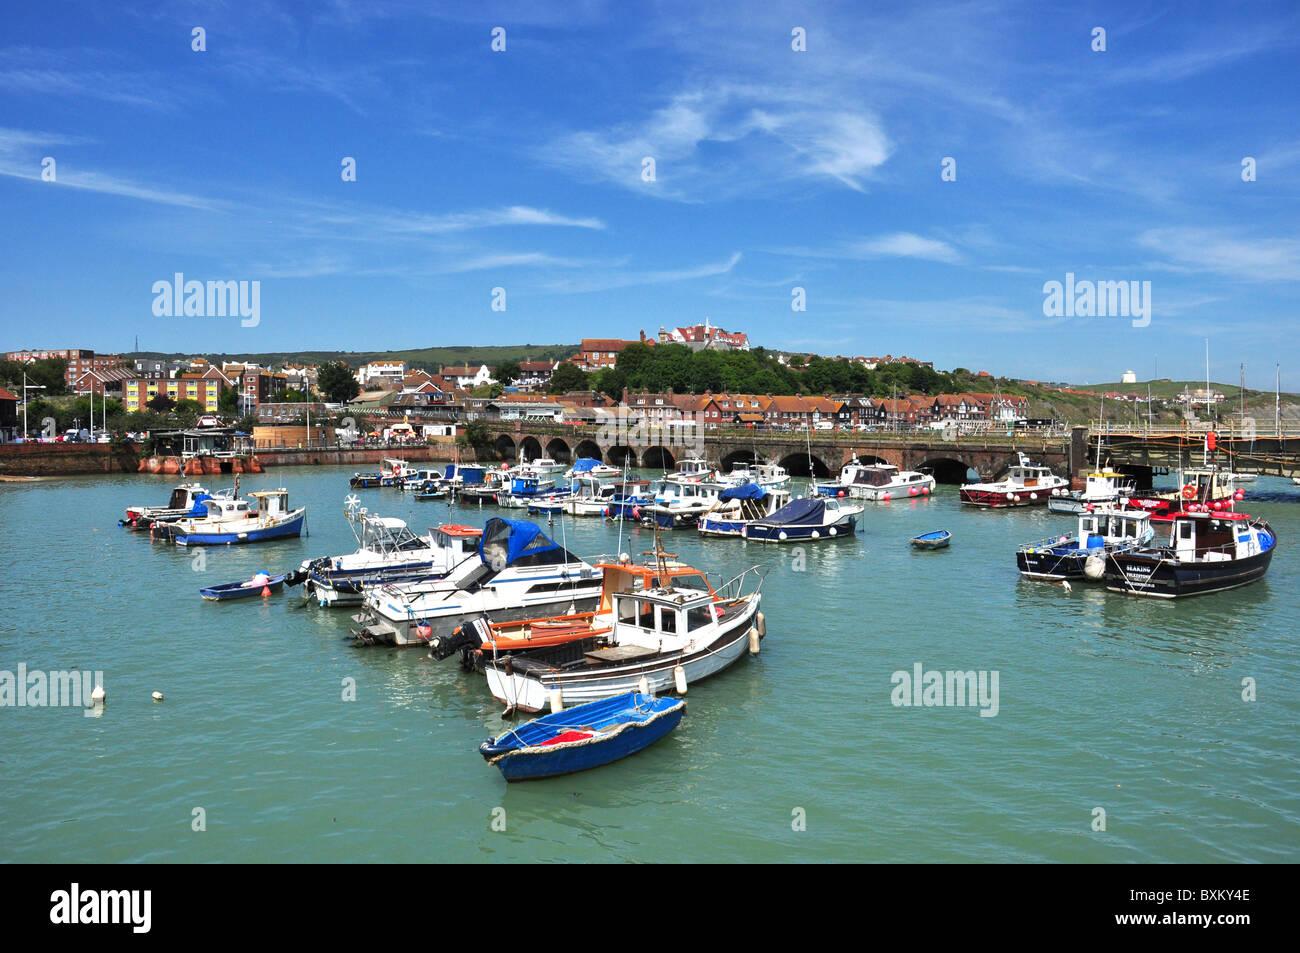 Folkestone harbour, Kent, UK - Stock Image